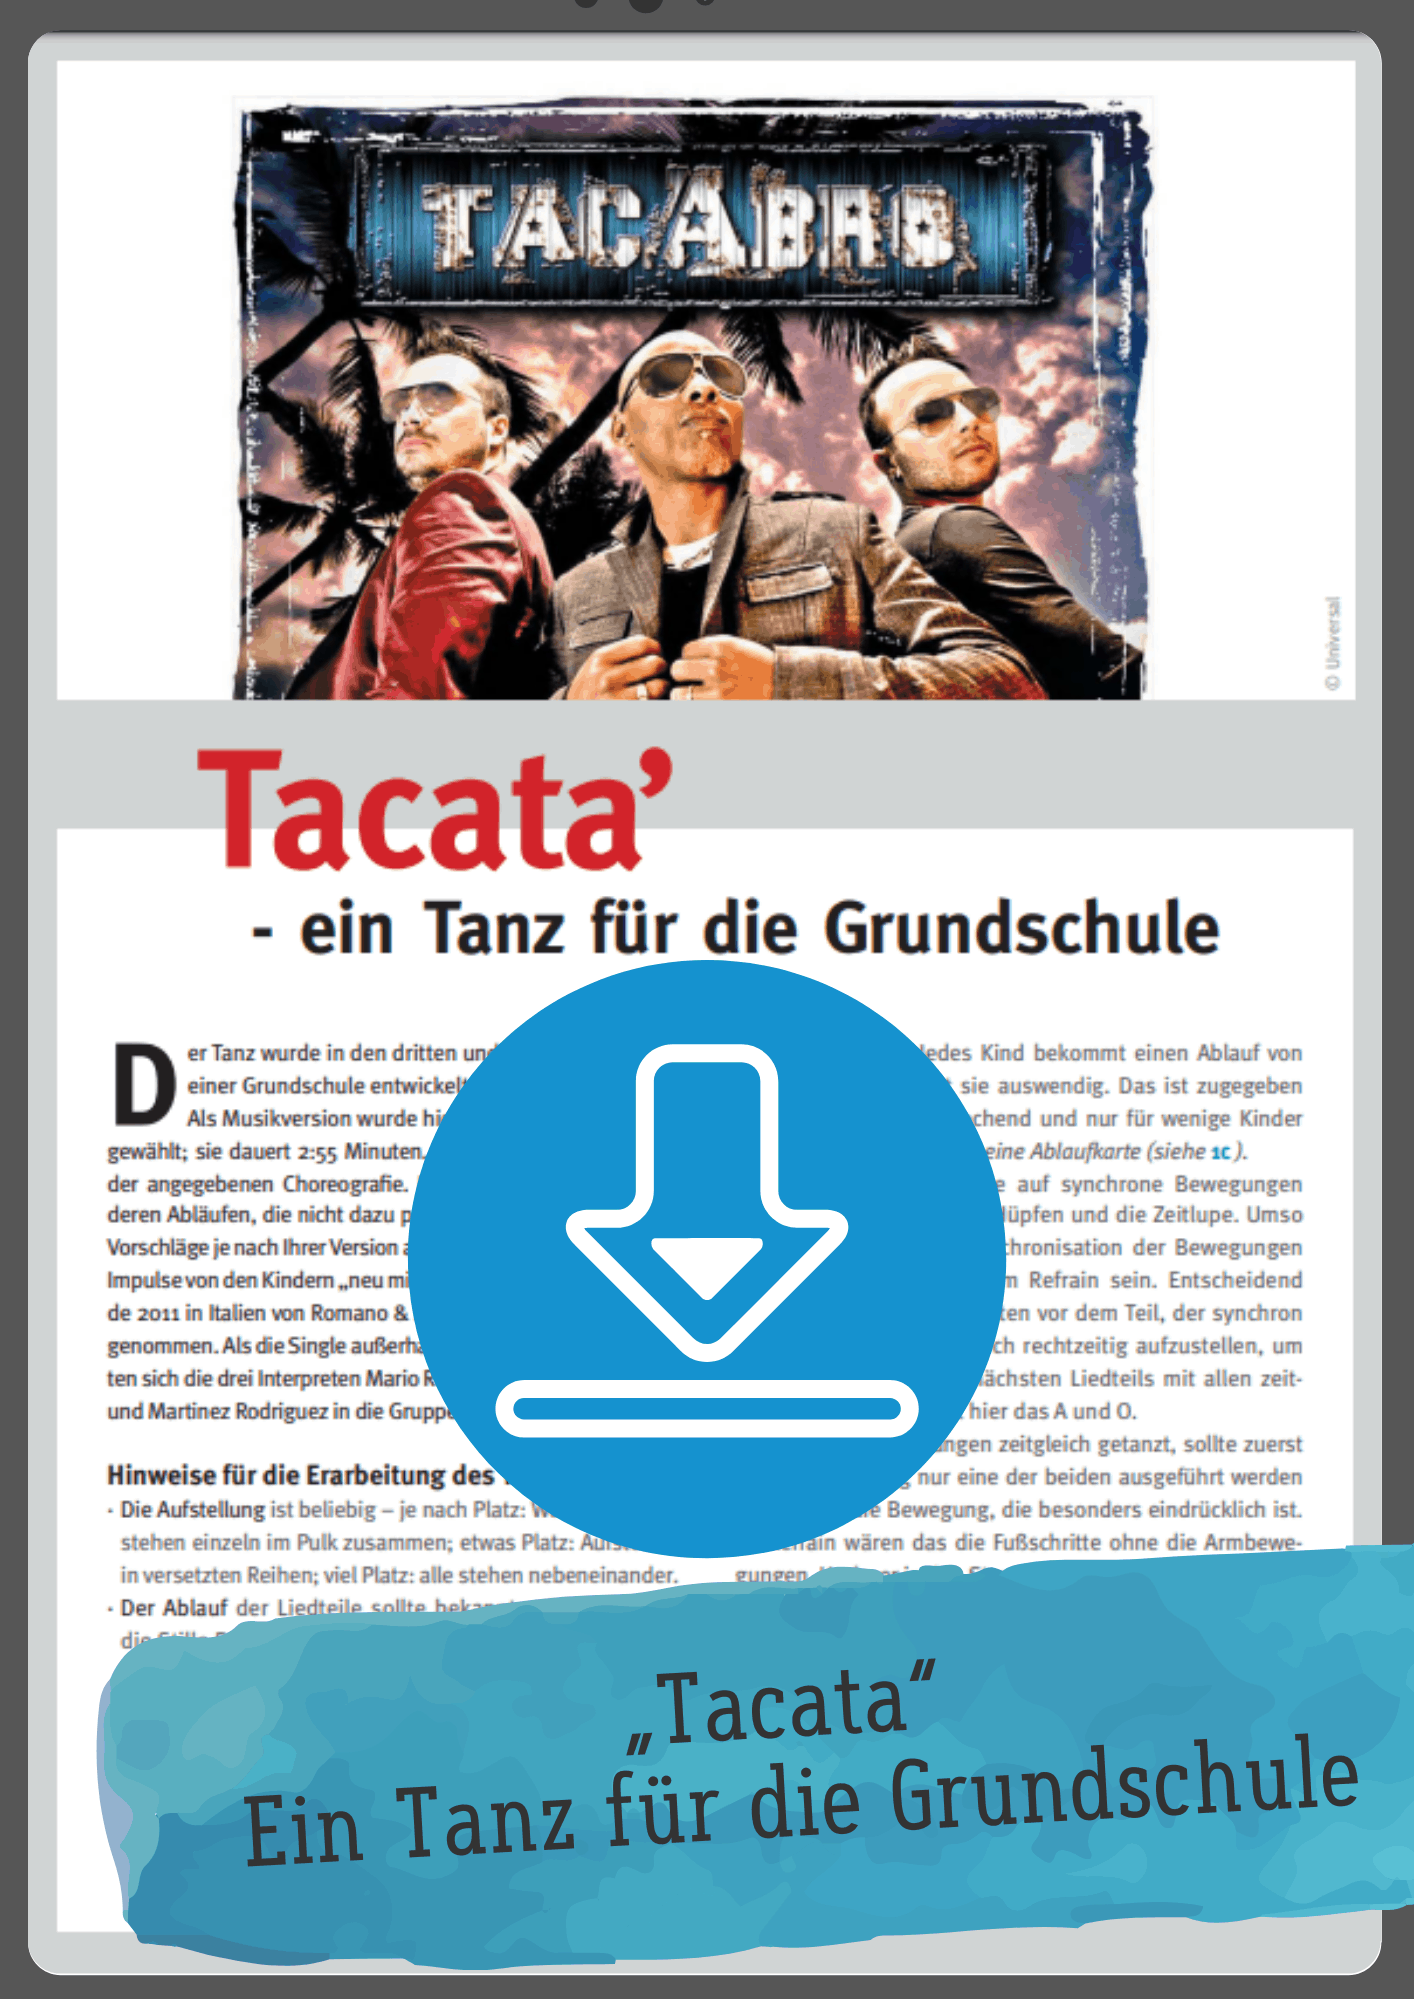 Tacata Tanz